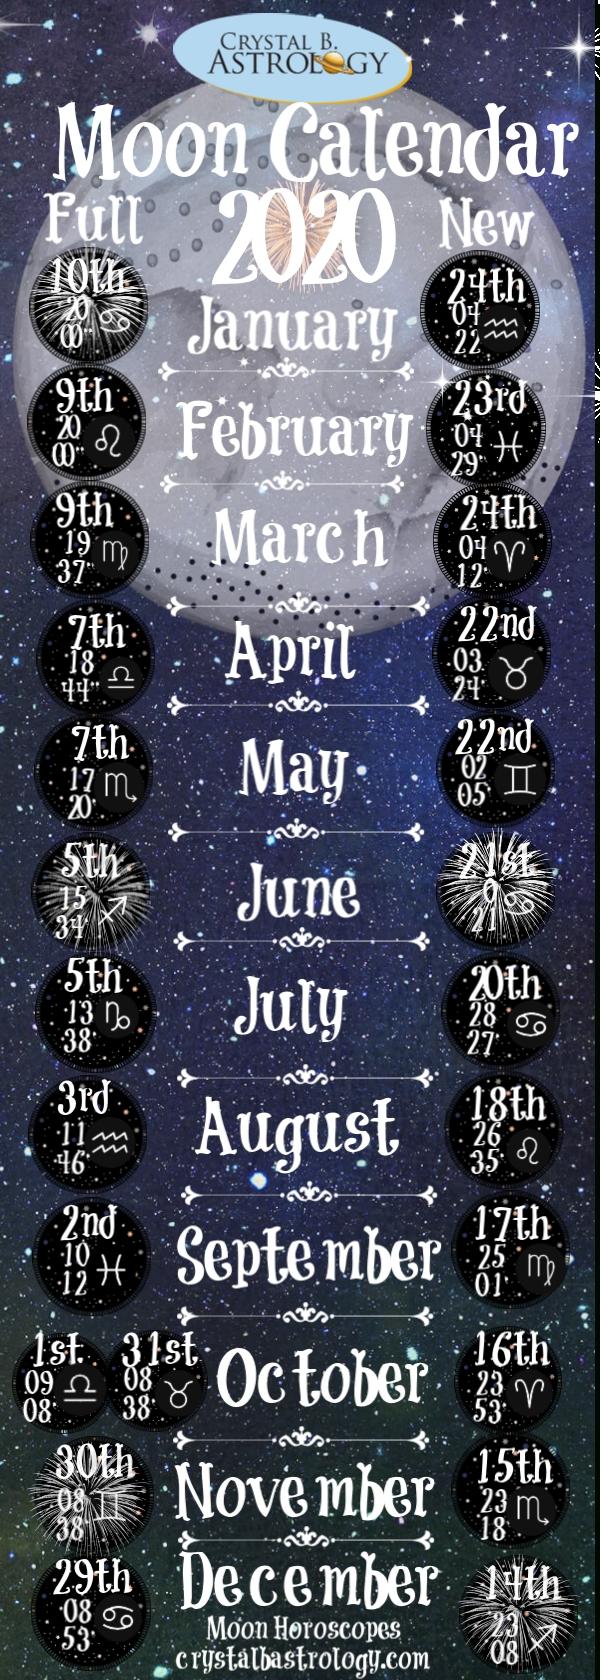 Moon Calendar 2020 #wiccanspells | Moon Calendar, New Moon